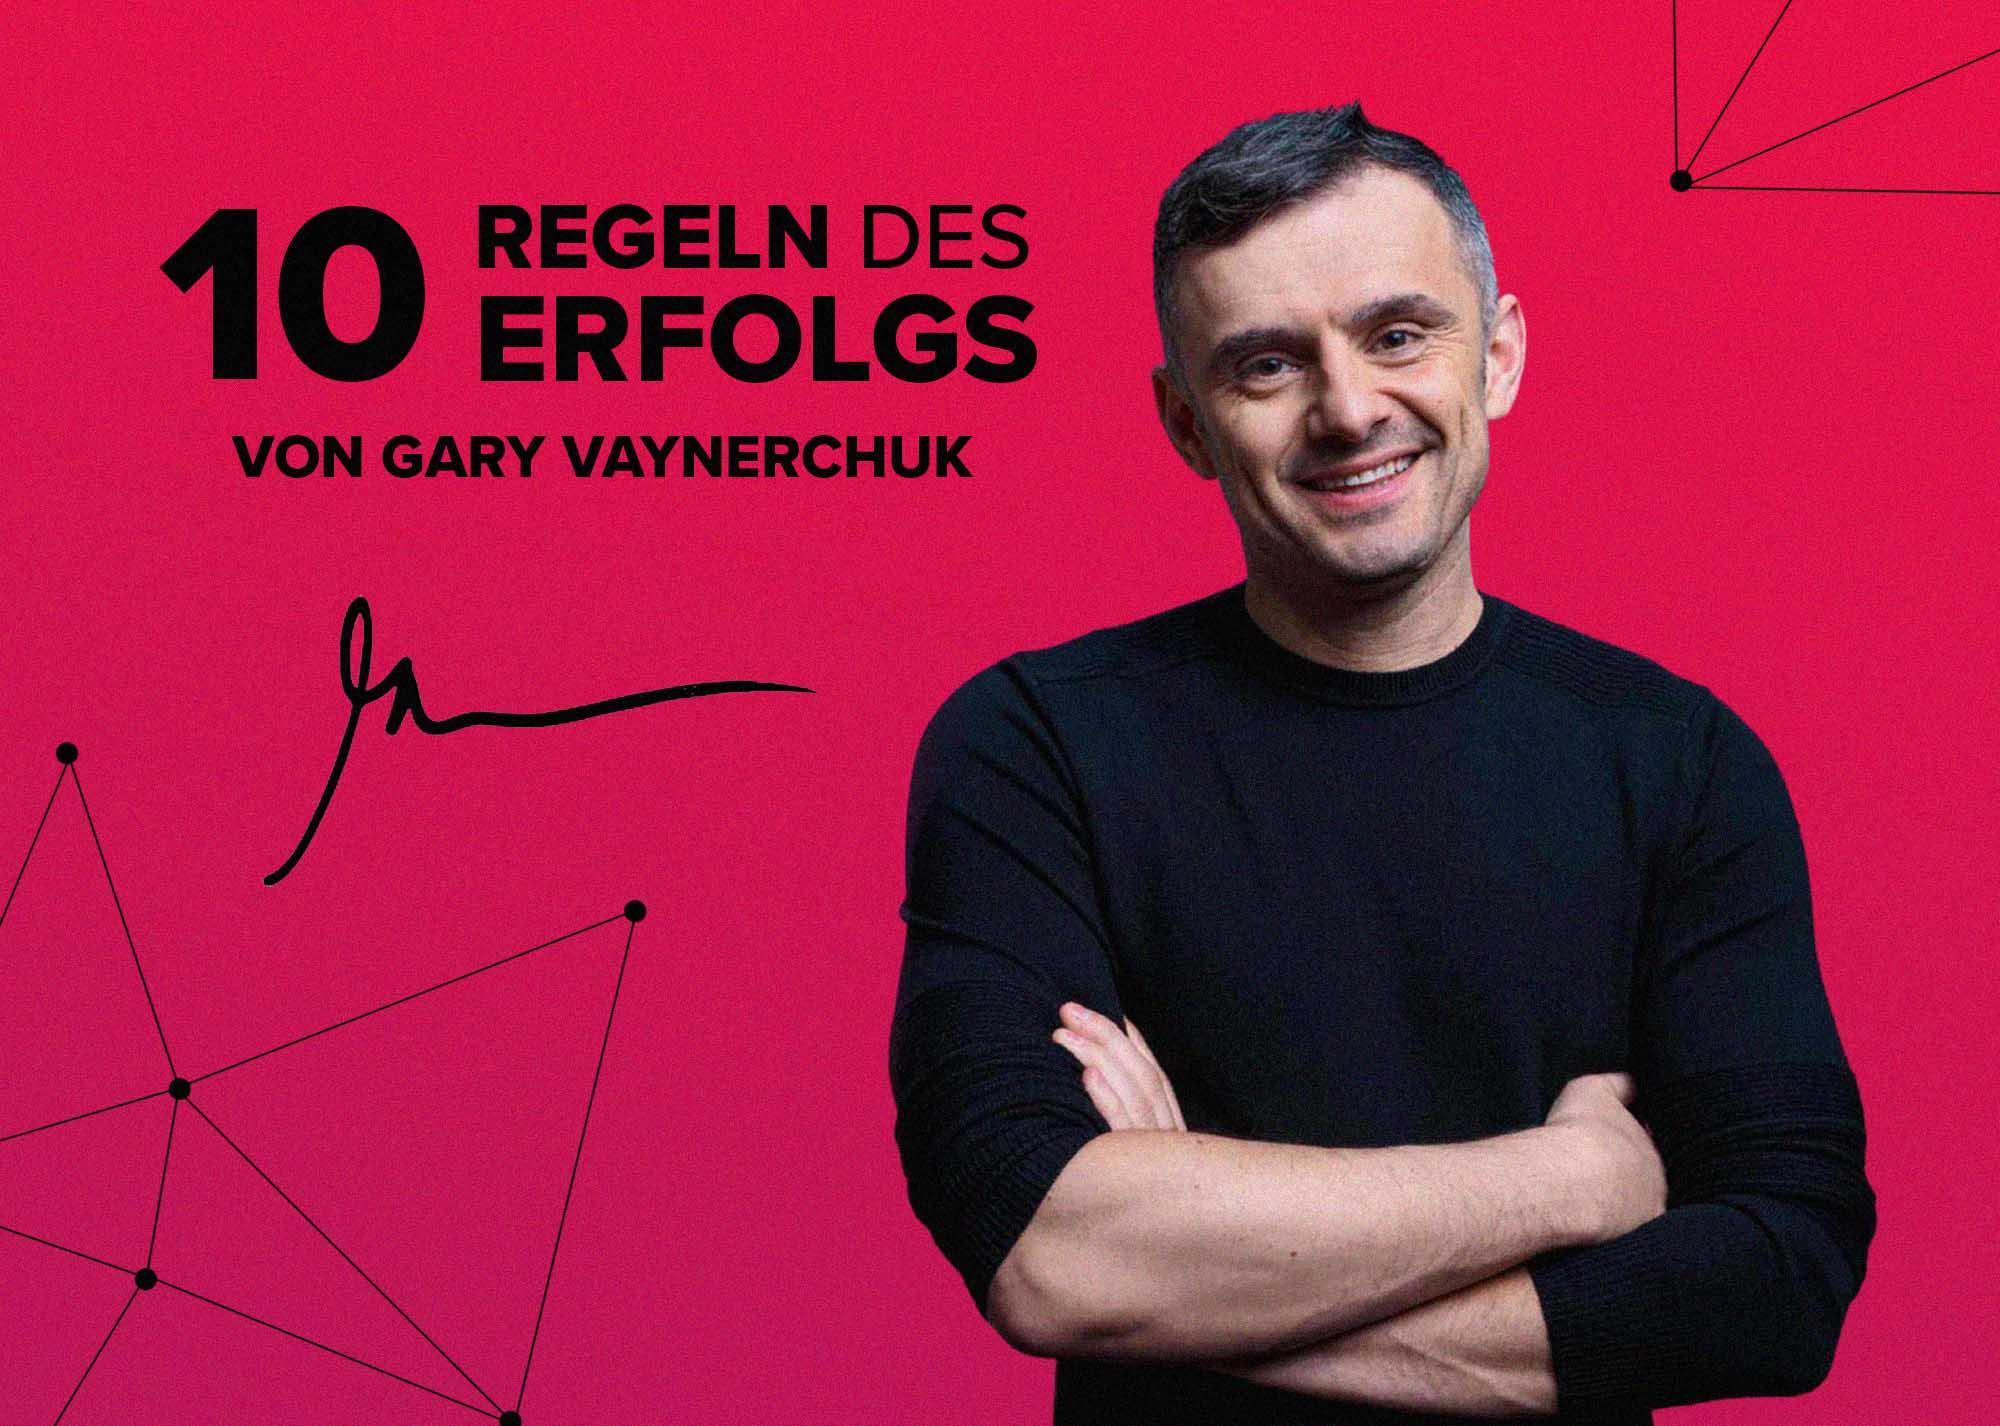 Gary Vaynerchuk gary vee regeln des Erfolgs